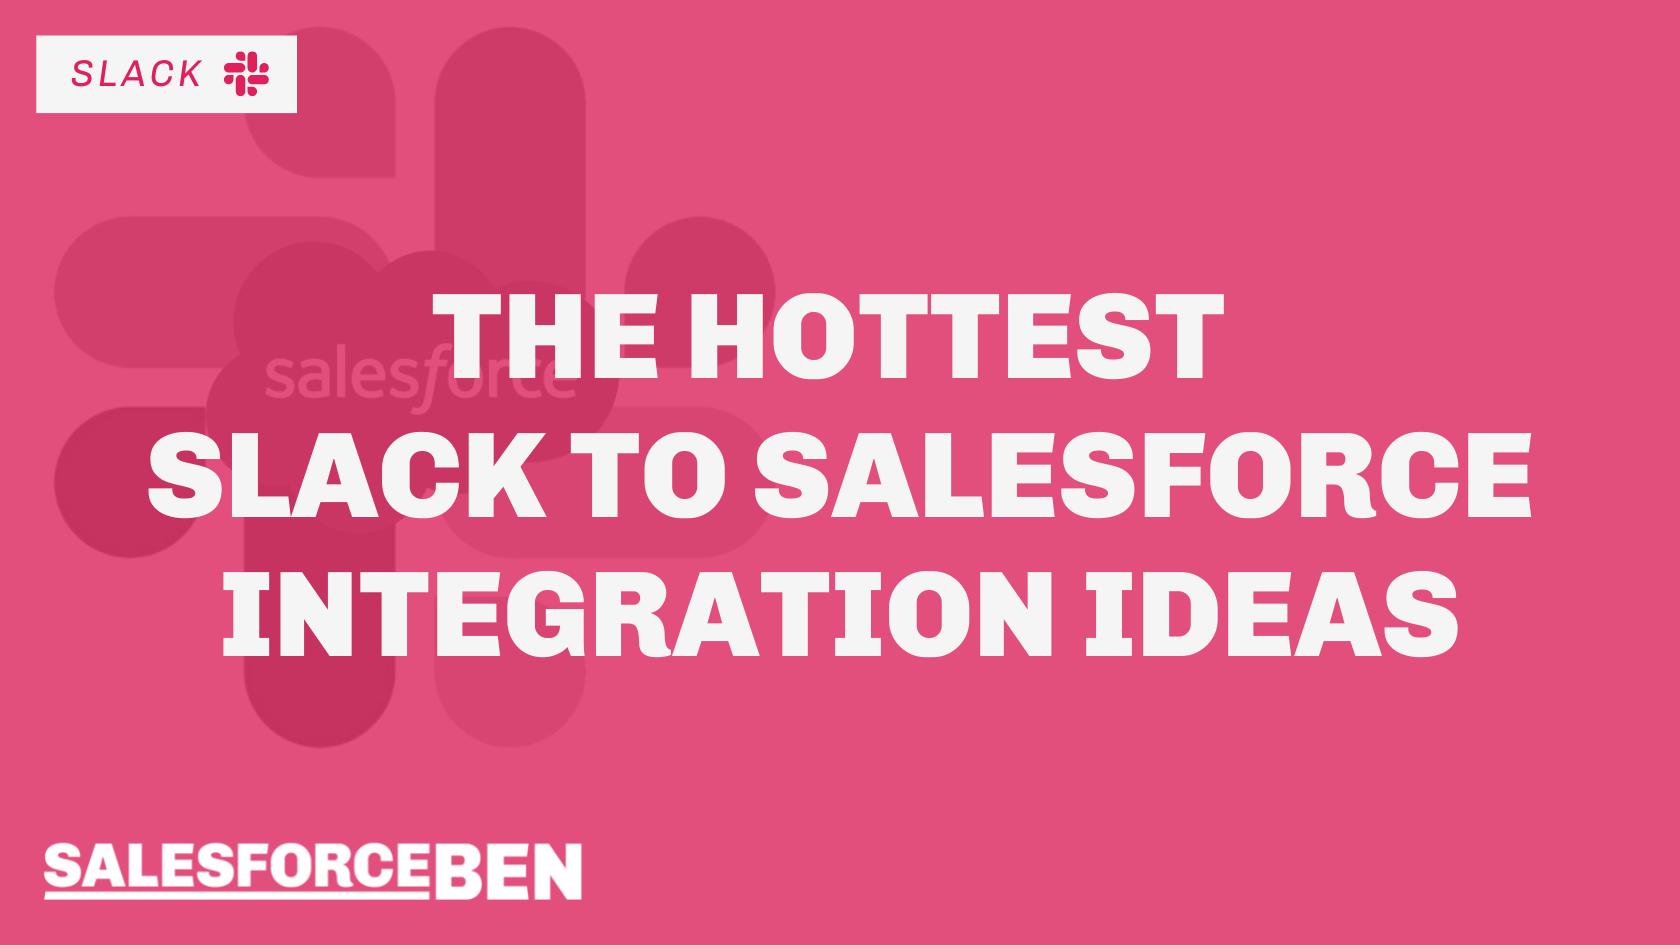 The Hottest Slack to Salesforce Integration Ideas